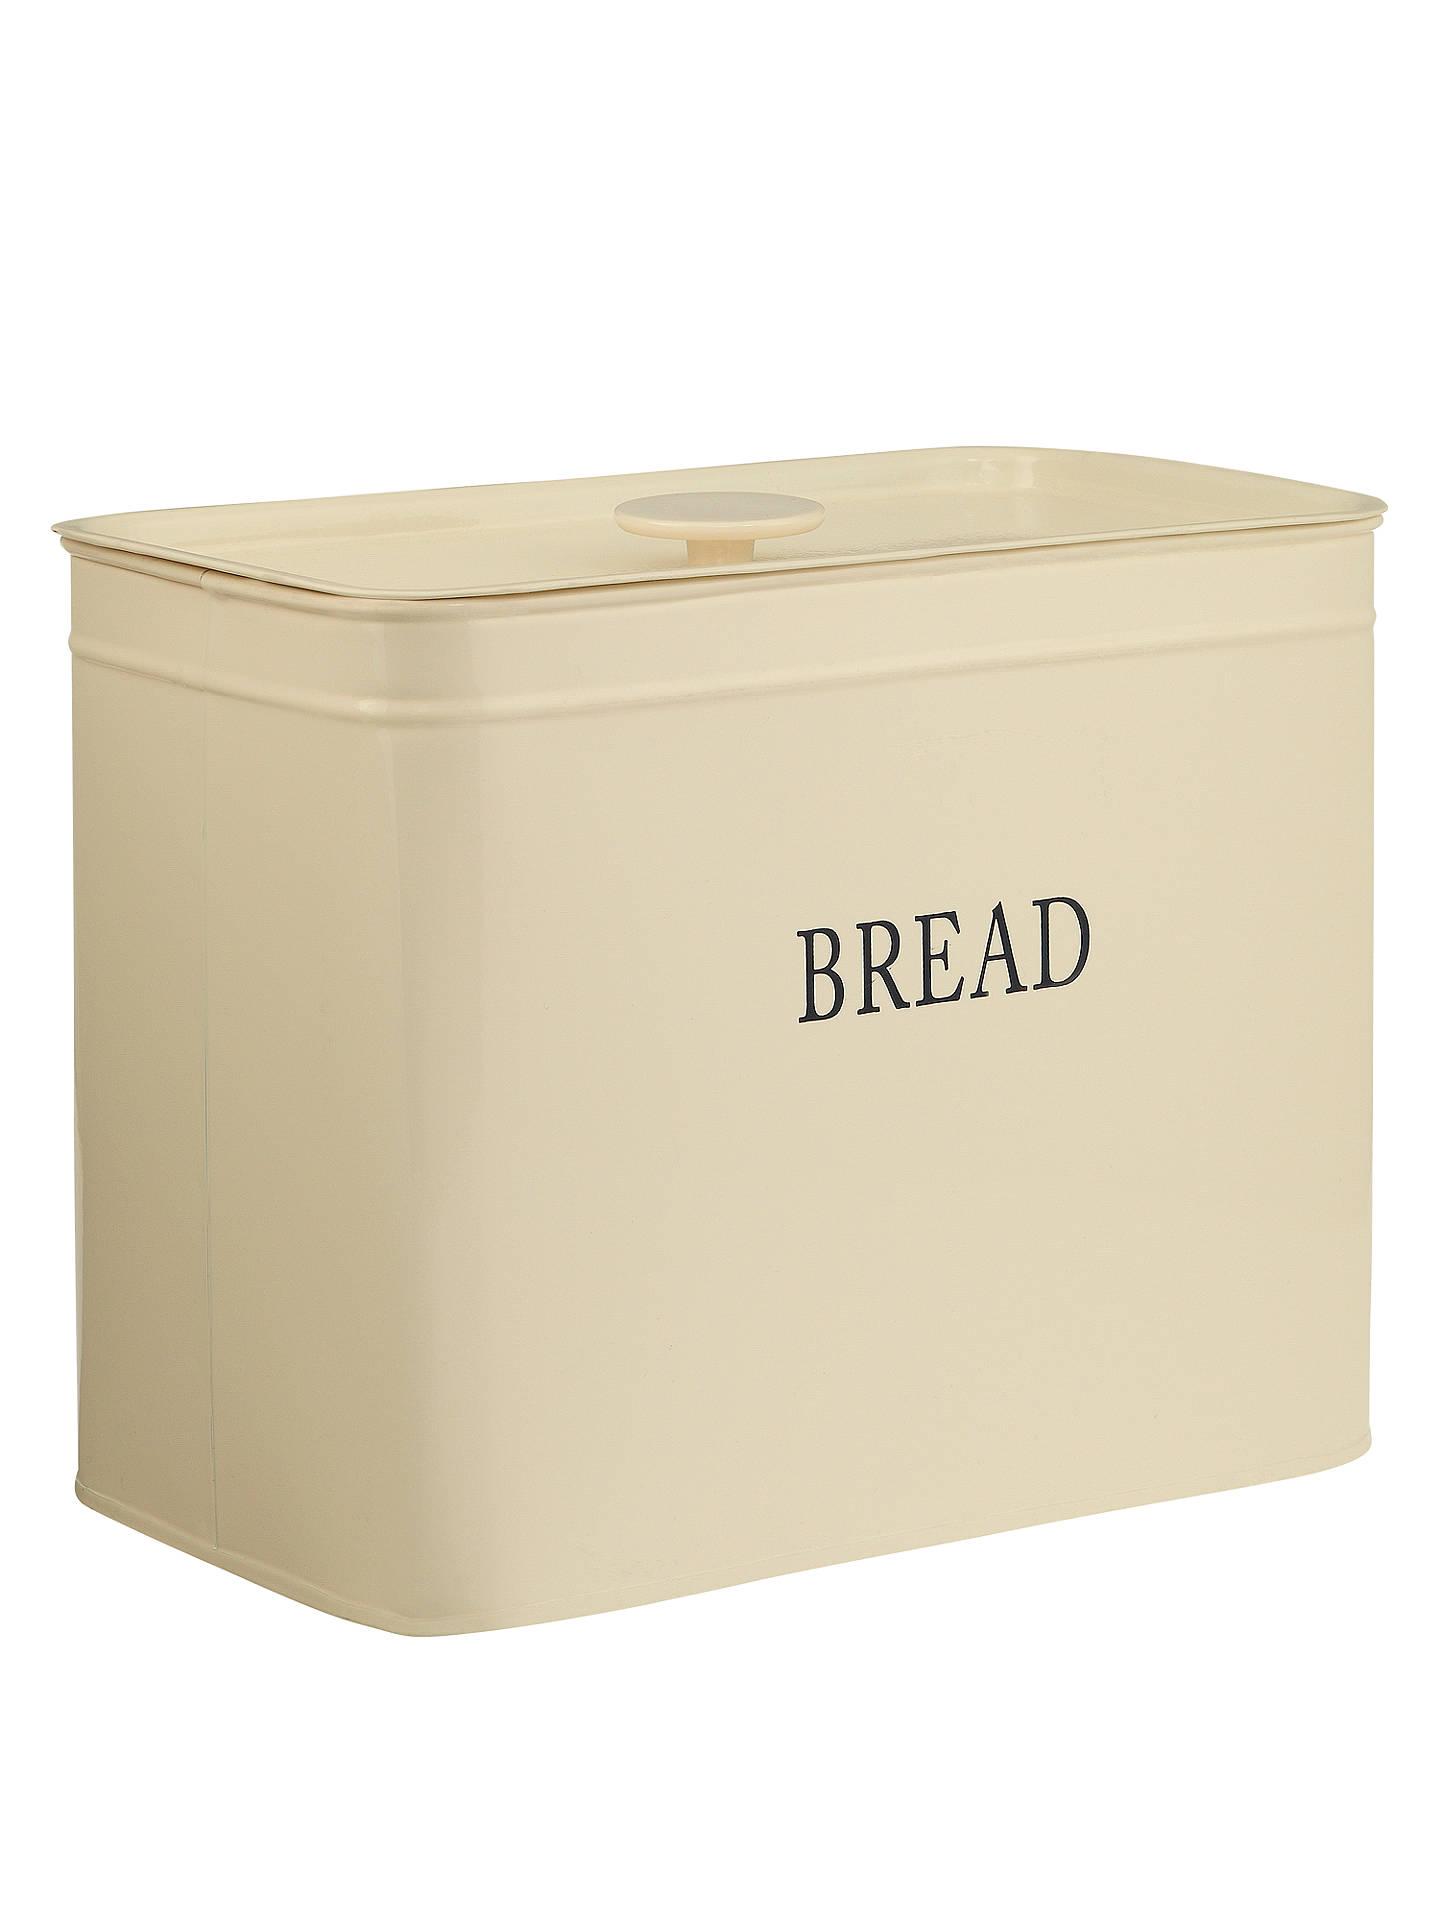 john lewis partners classic enamel bread bin at john. Black Bedroom Furniture Sets. Home Design Ideas